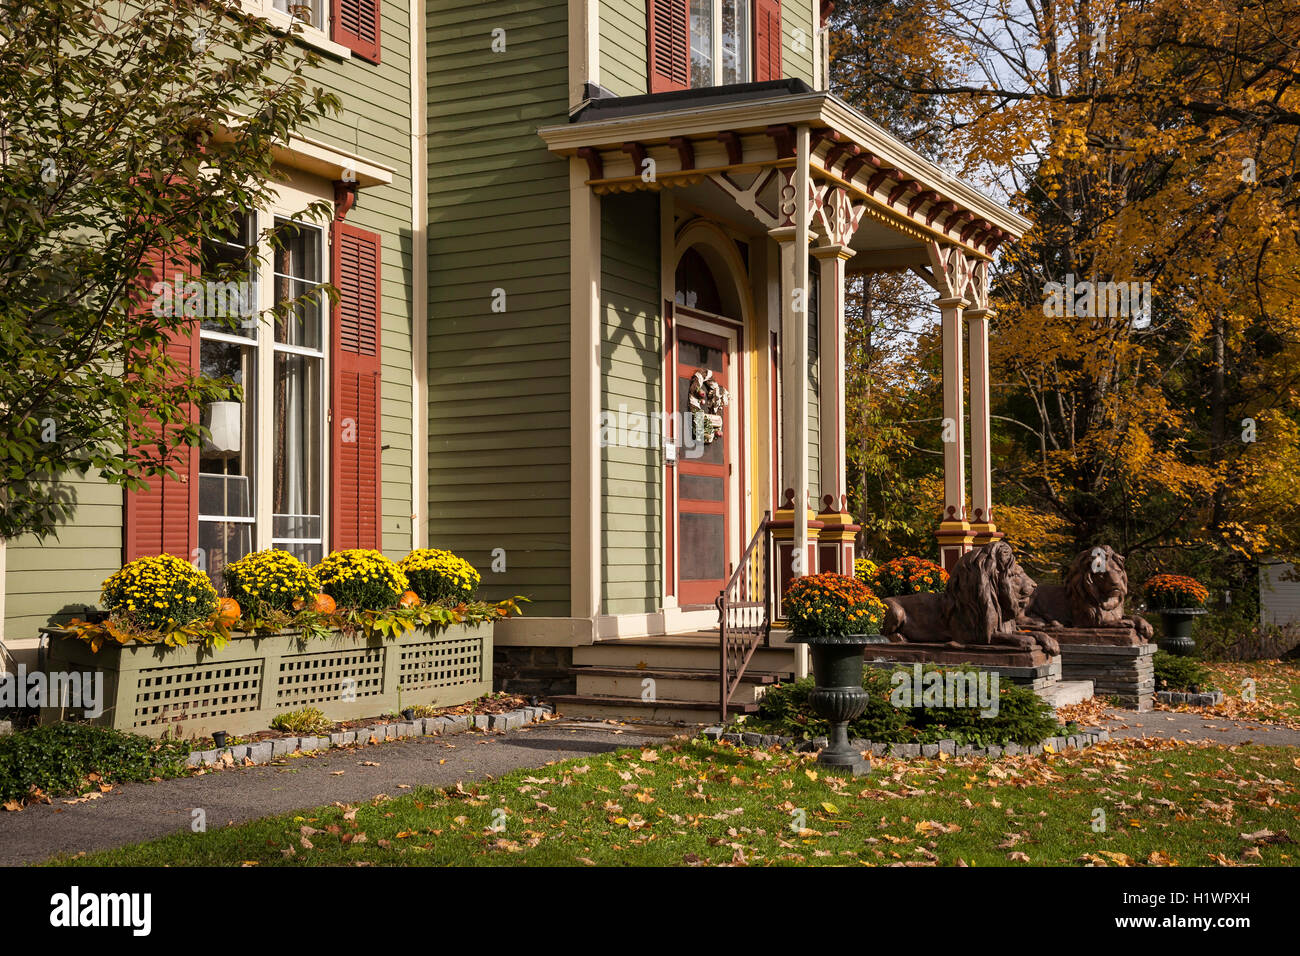 Landmark Inn, Bed and Breakfast, Cooperstown, NY Stock Photo